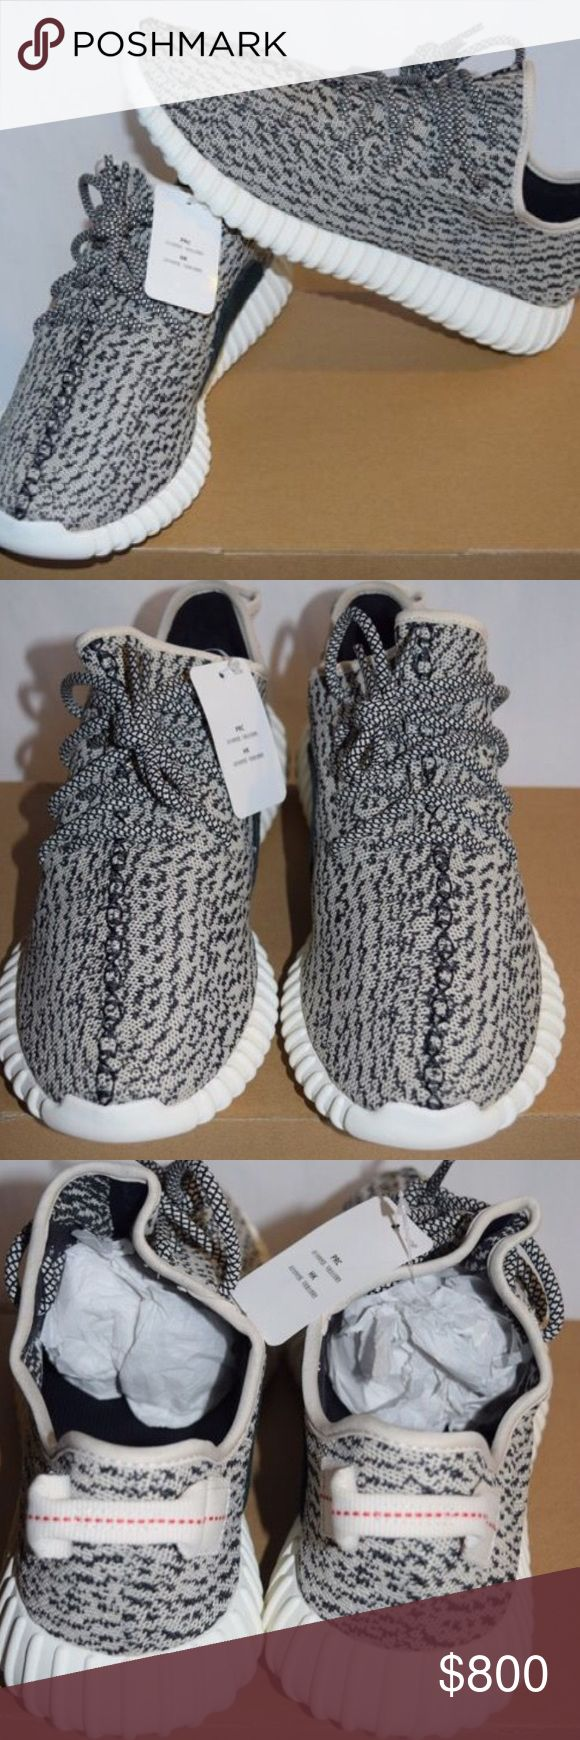 Yeezy boosts New Yeezy Shoes